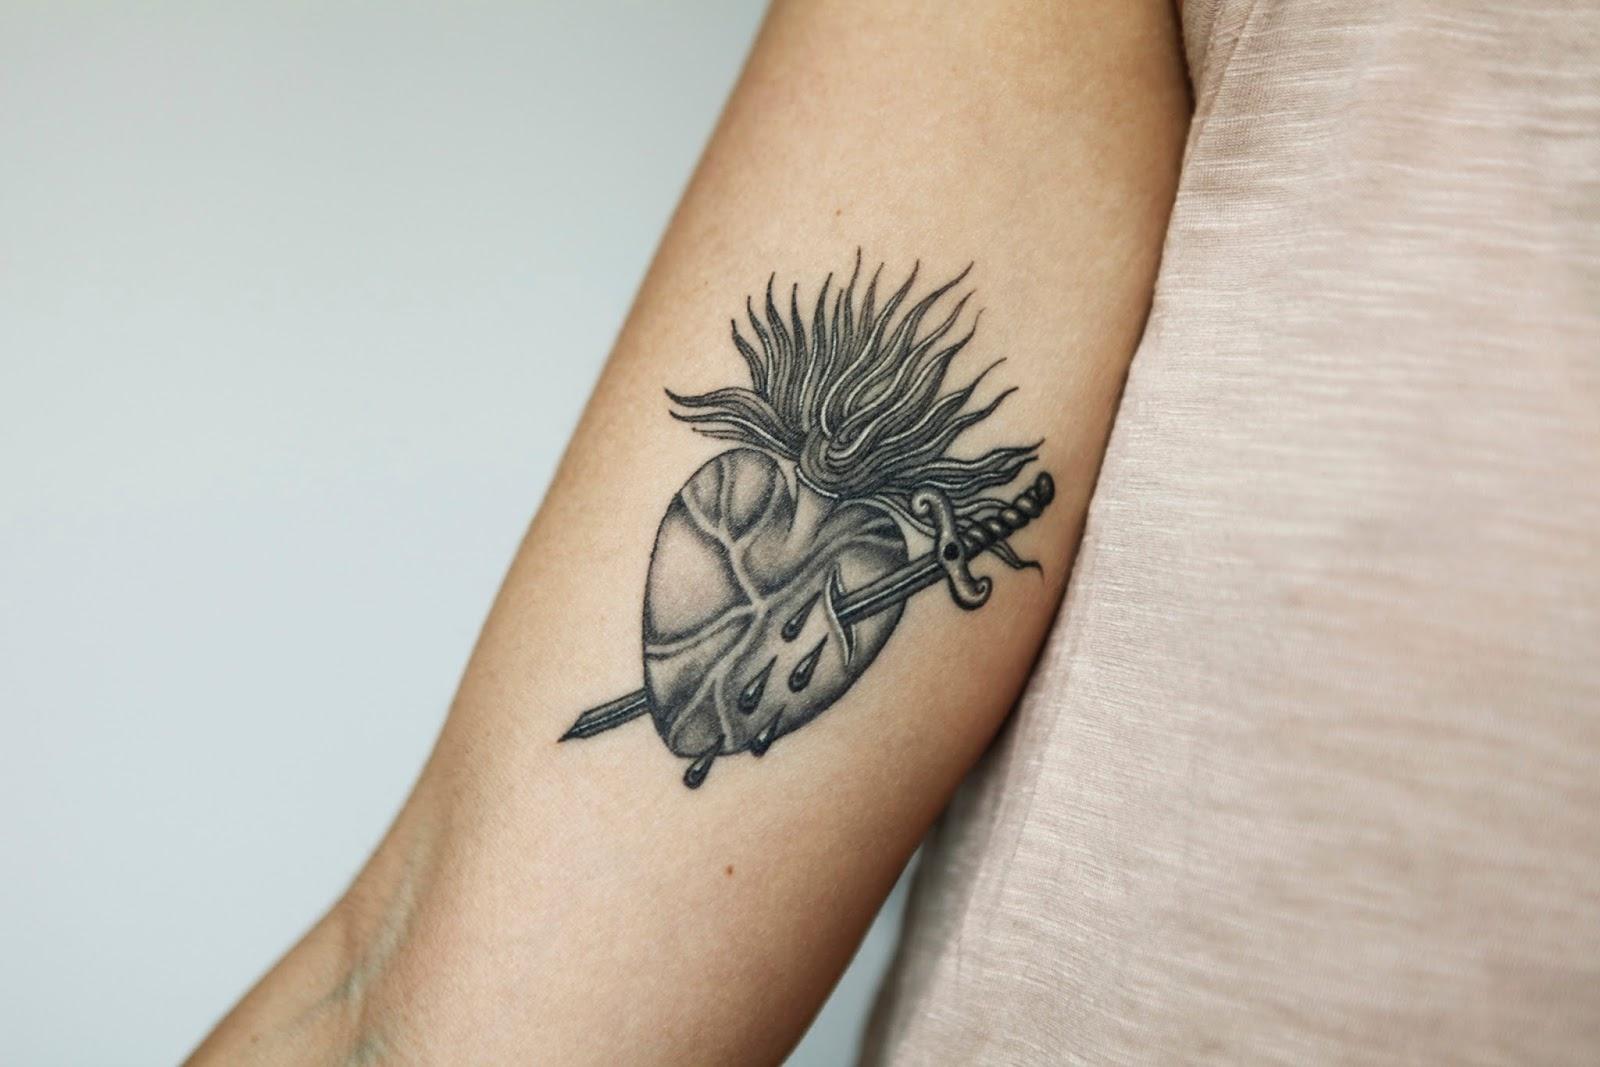 Tattoo sang bleu chavanitas for Sang bleu tattoo